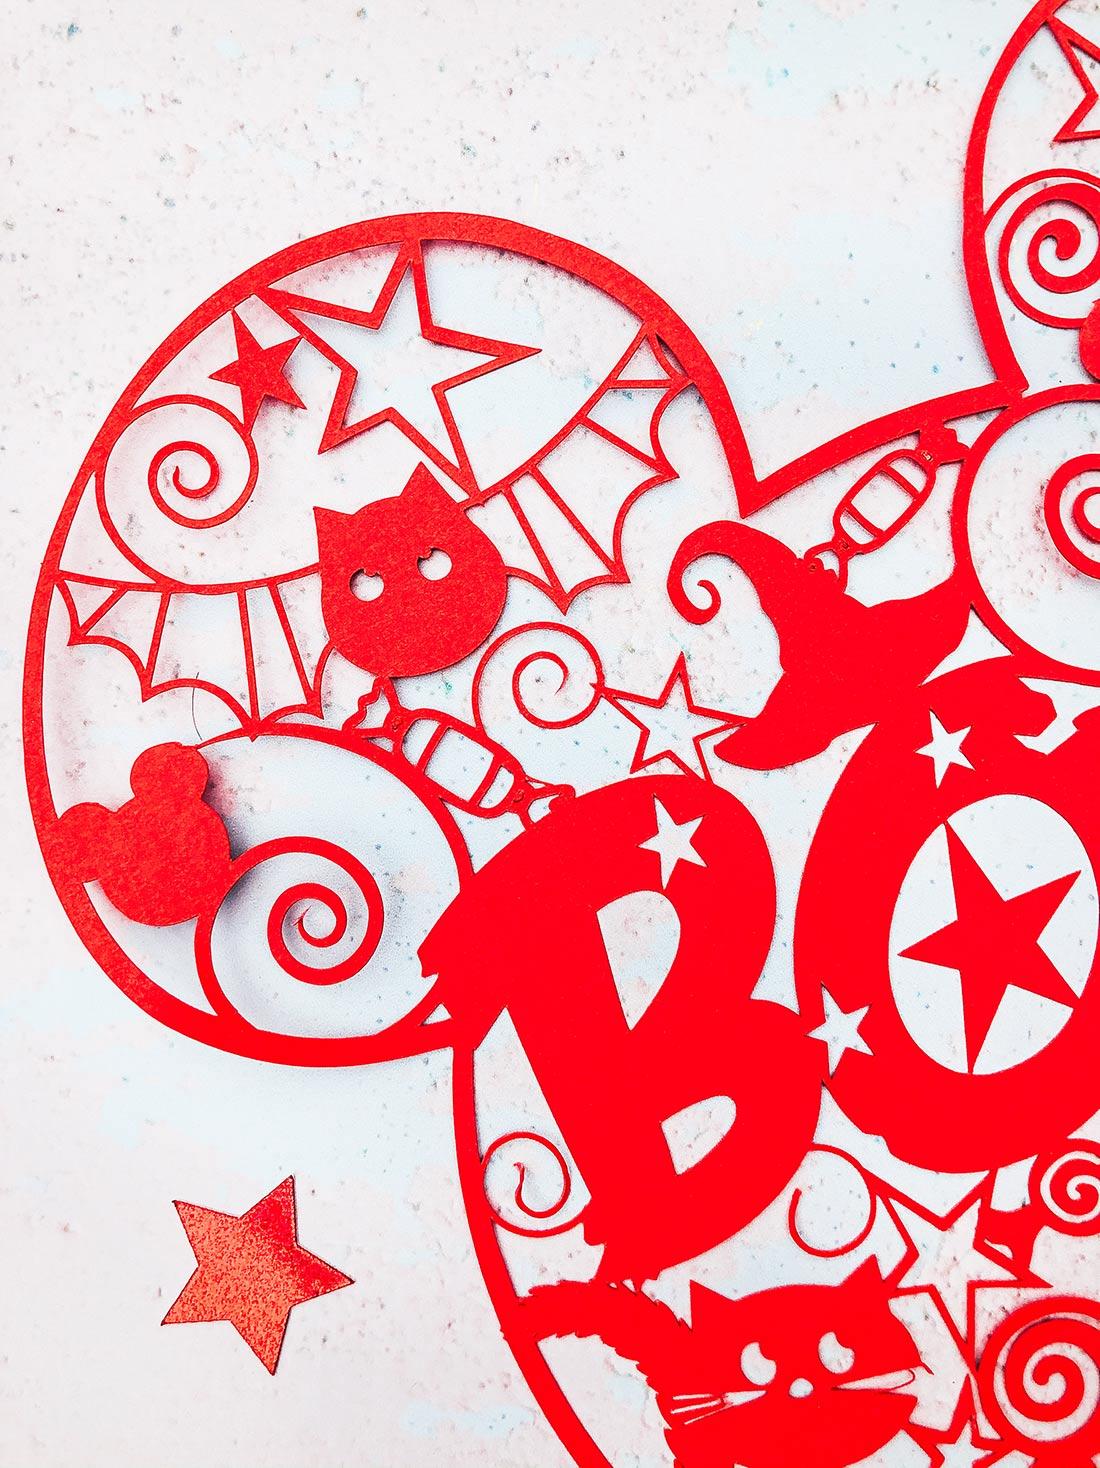 Mickey Mouse Pop Art Paper Cut